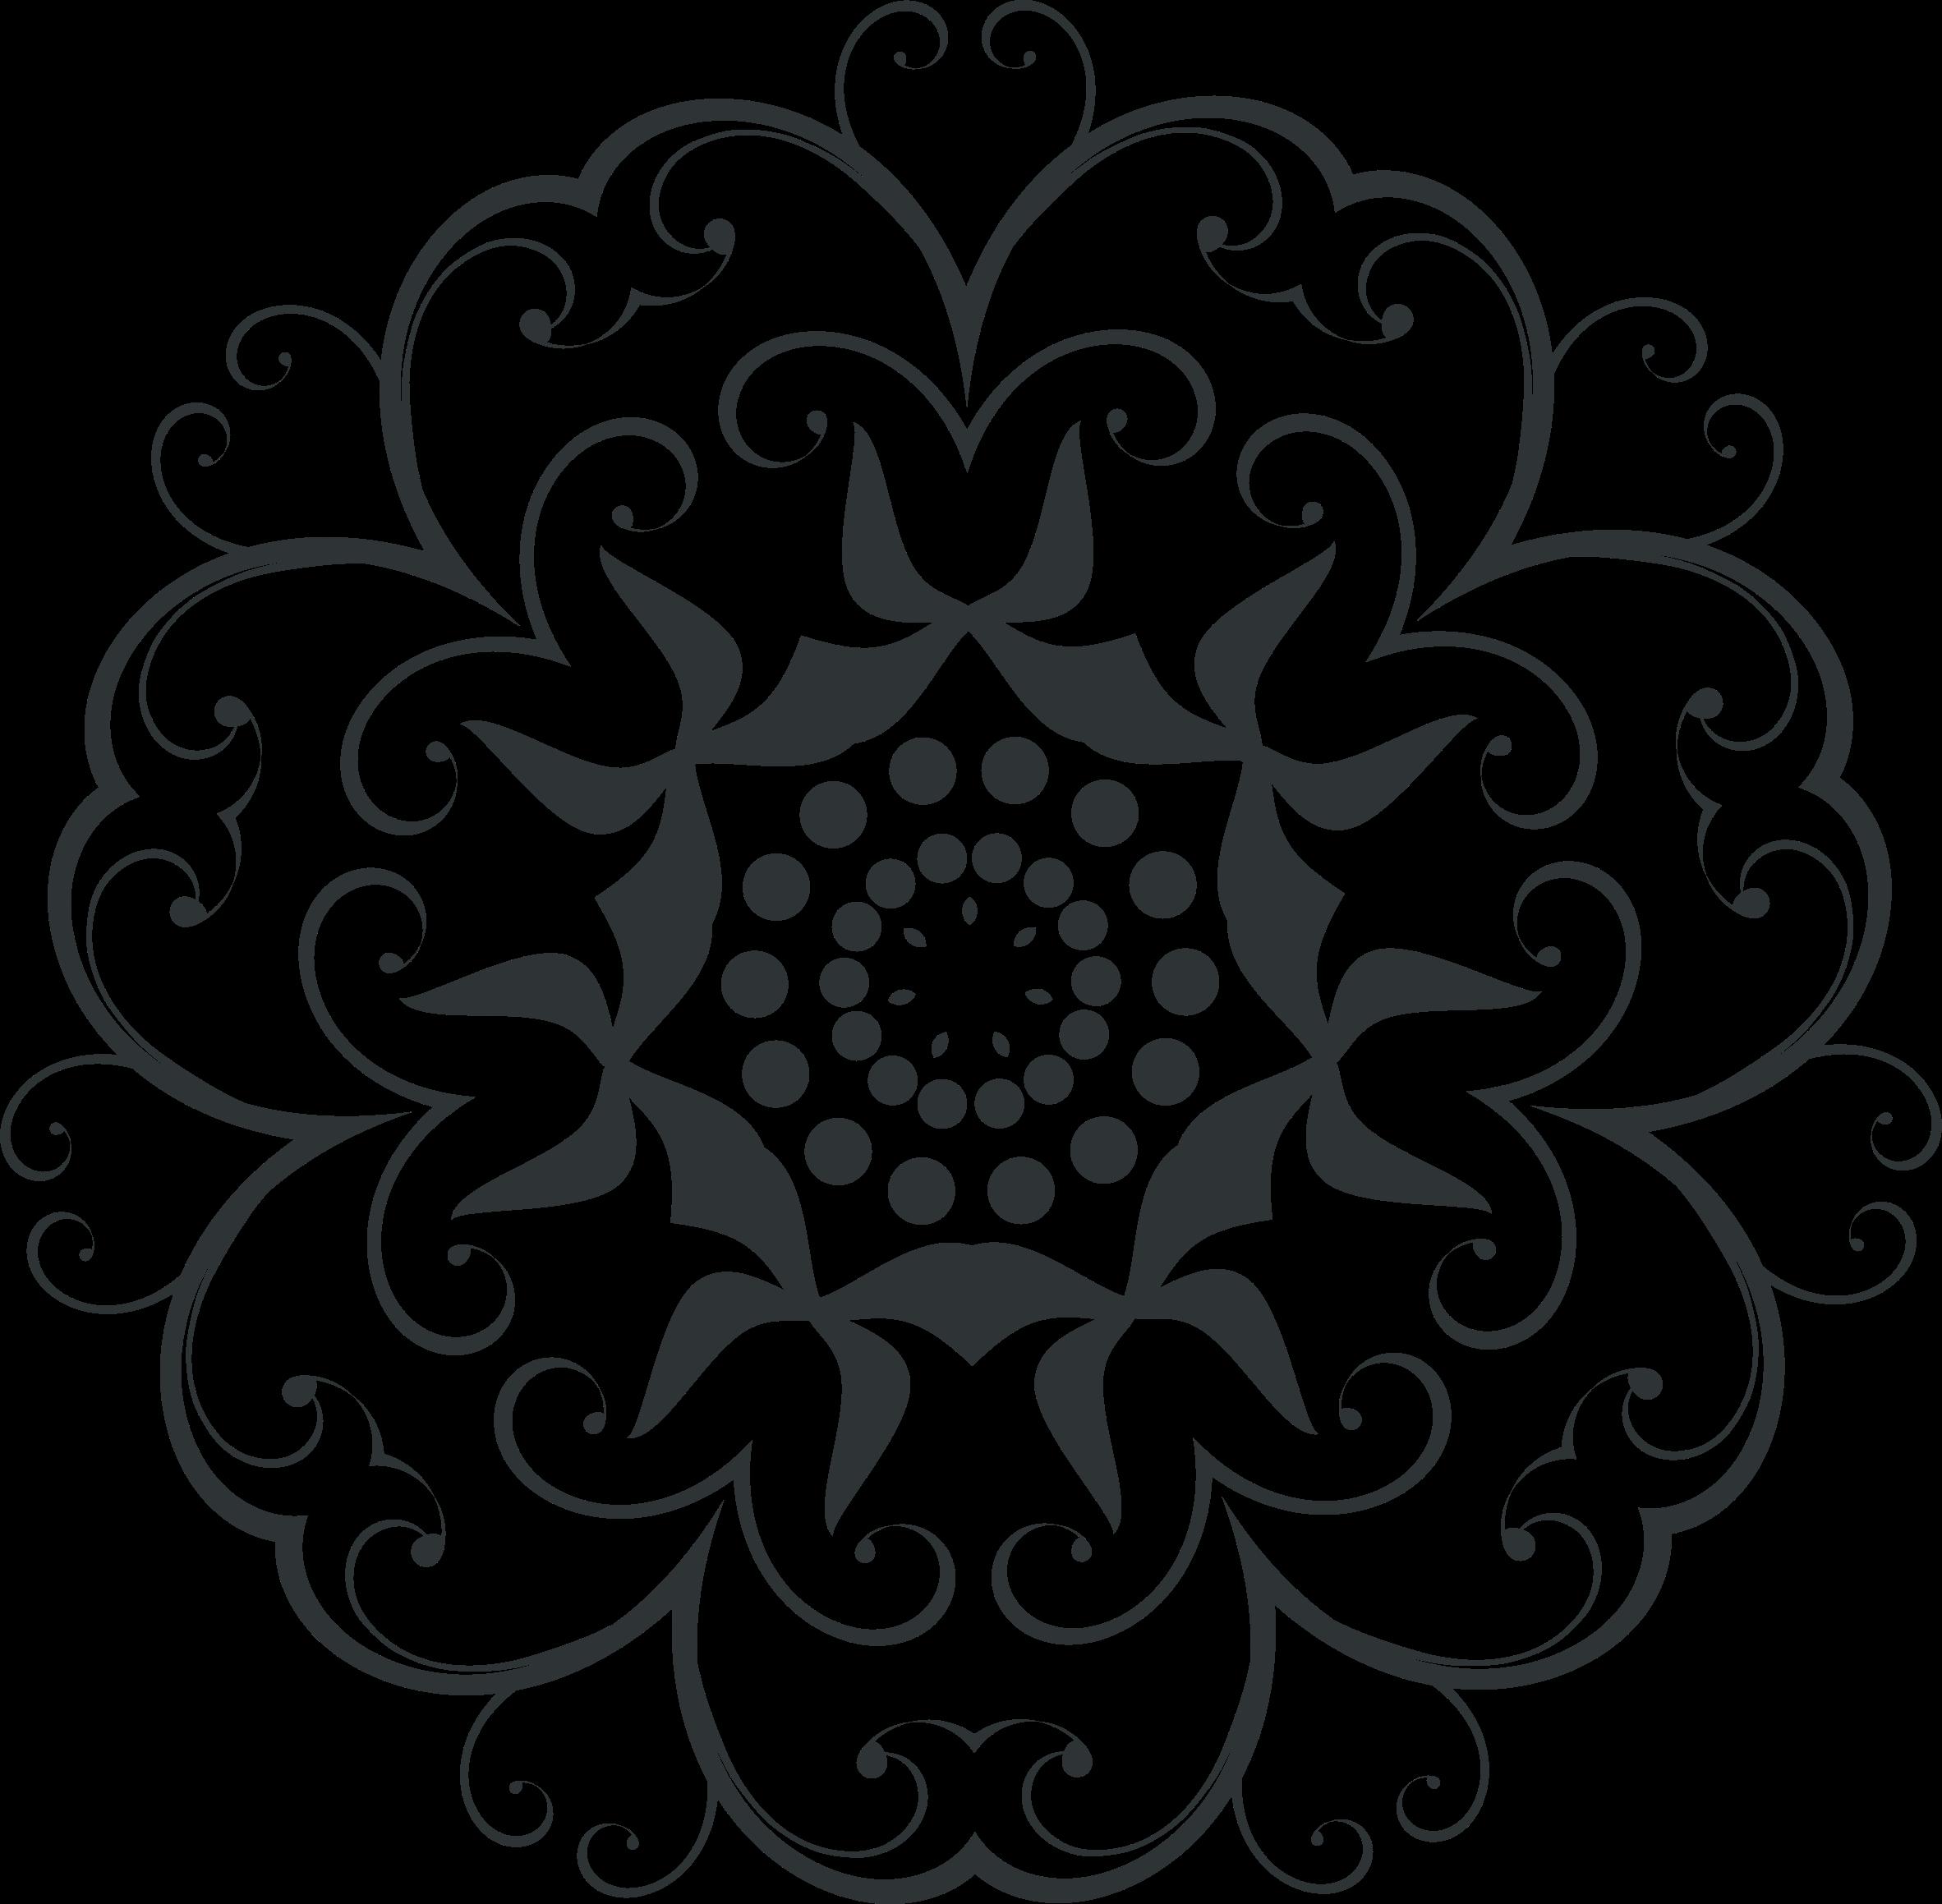 Flourish design big image. Lace clipart silhouette